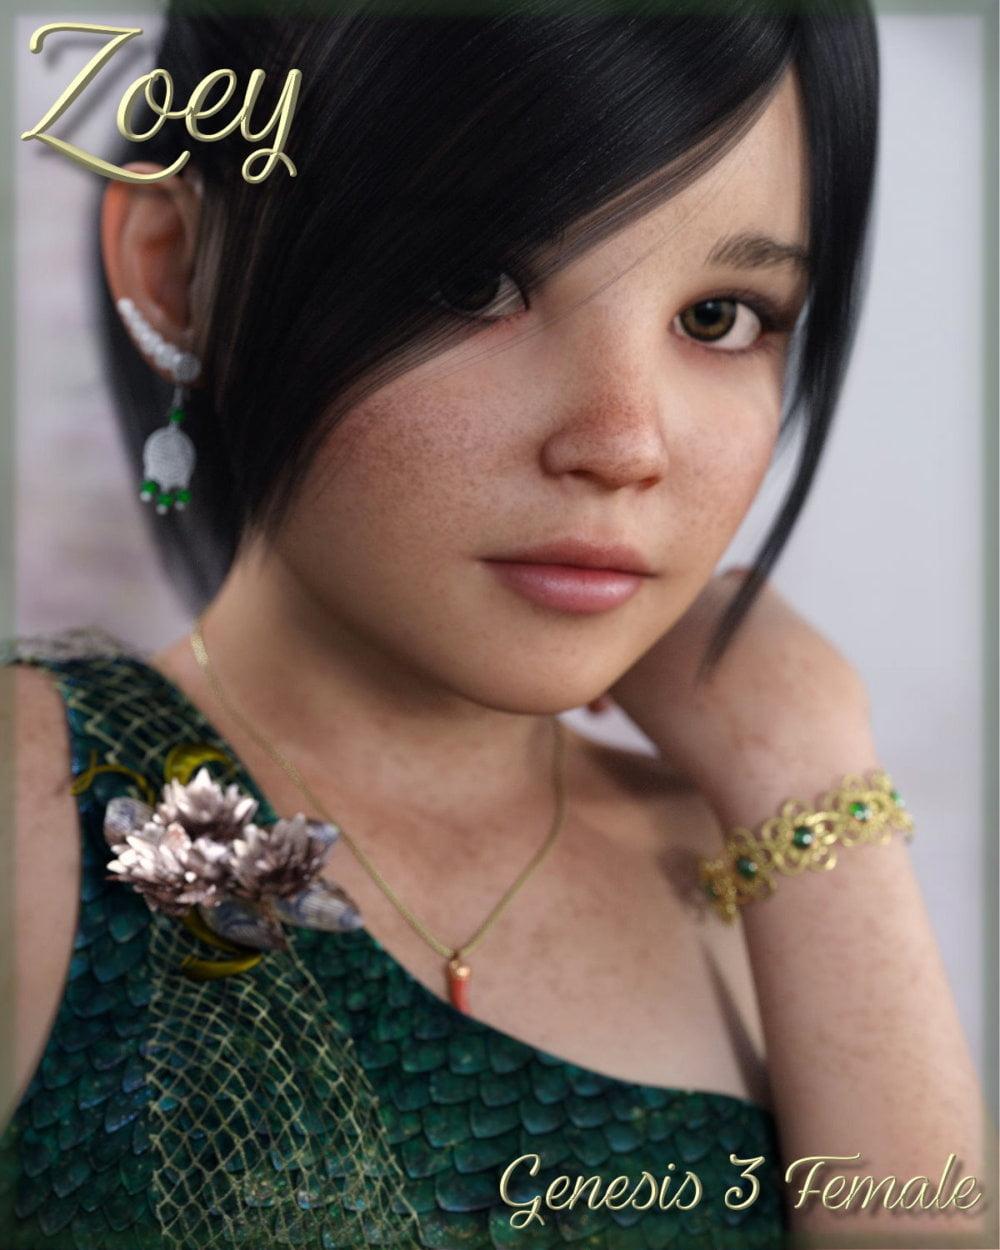 Zoey for Genesis 3 Female - character, daz-poser-carrara